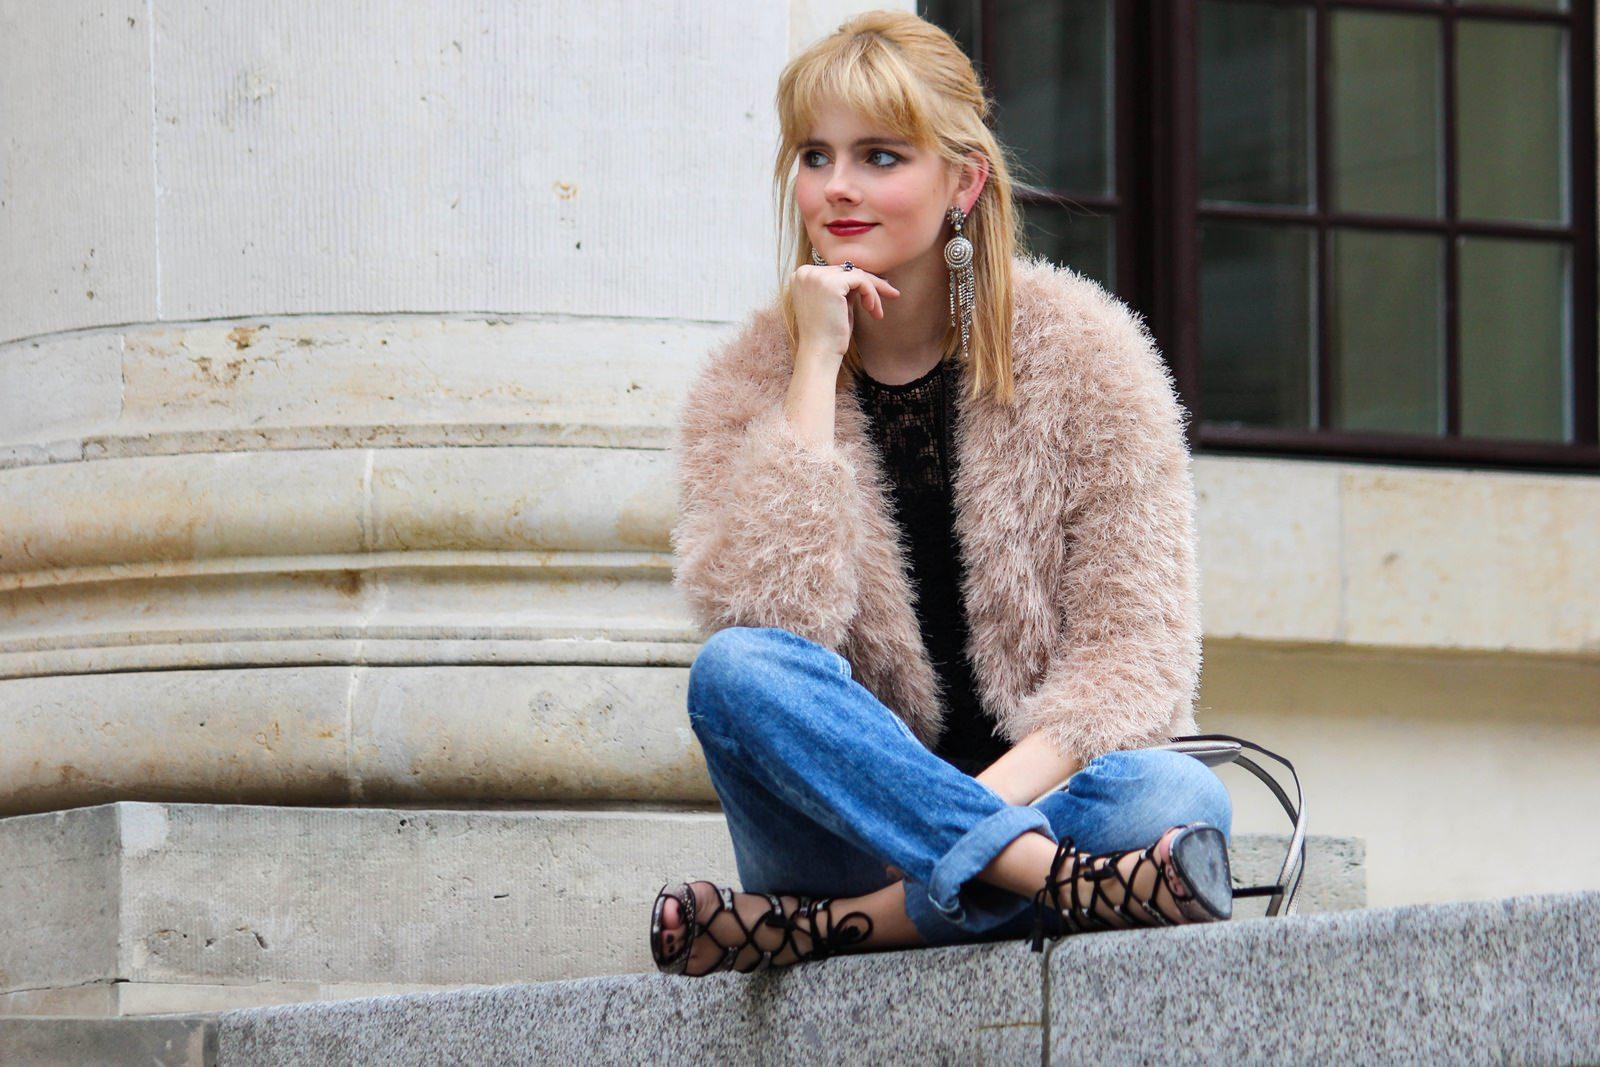 Des Belles Choses - Spot on snake print - Boyfriendjeans, fluffy jacket 9